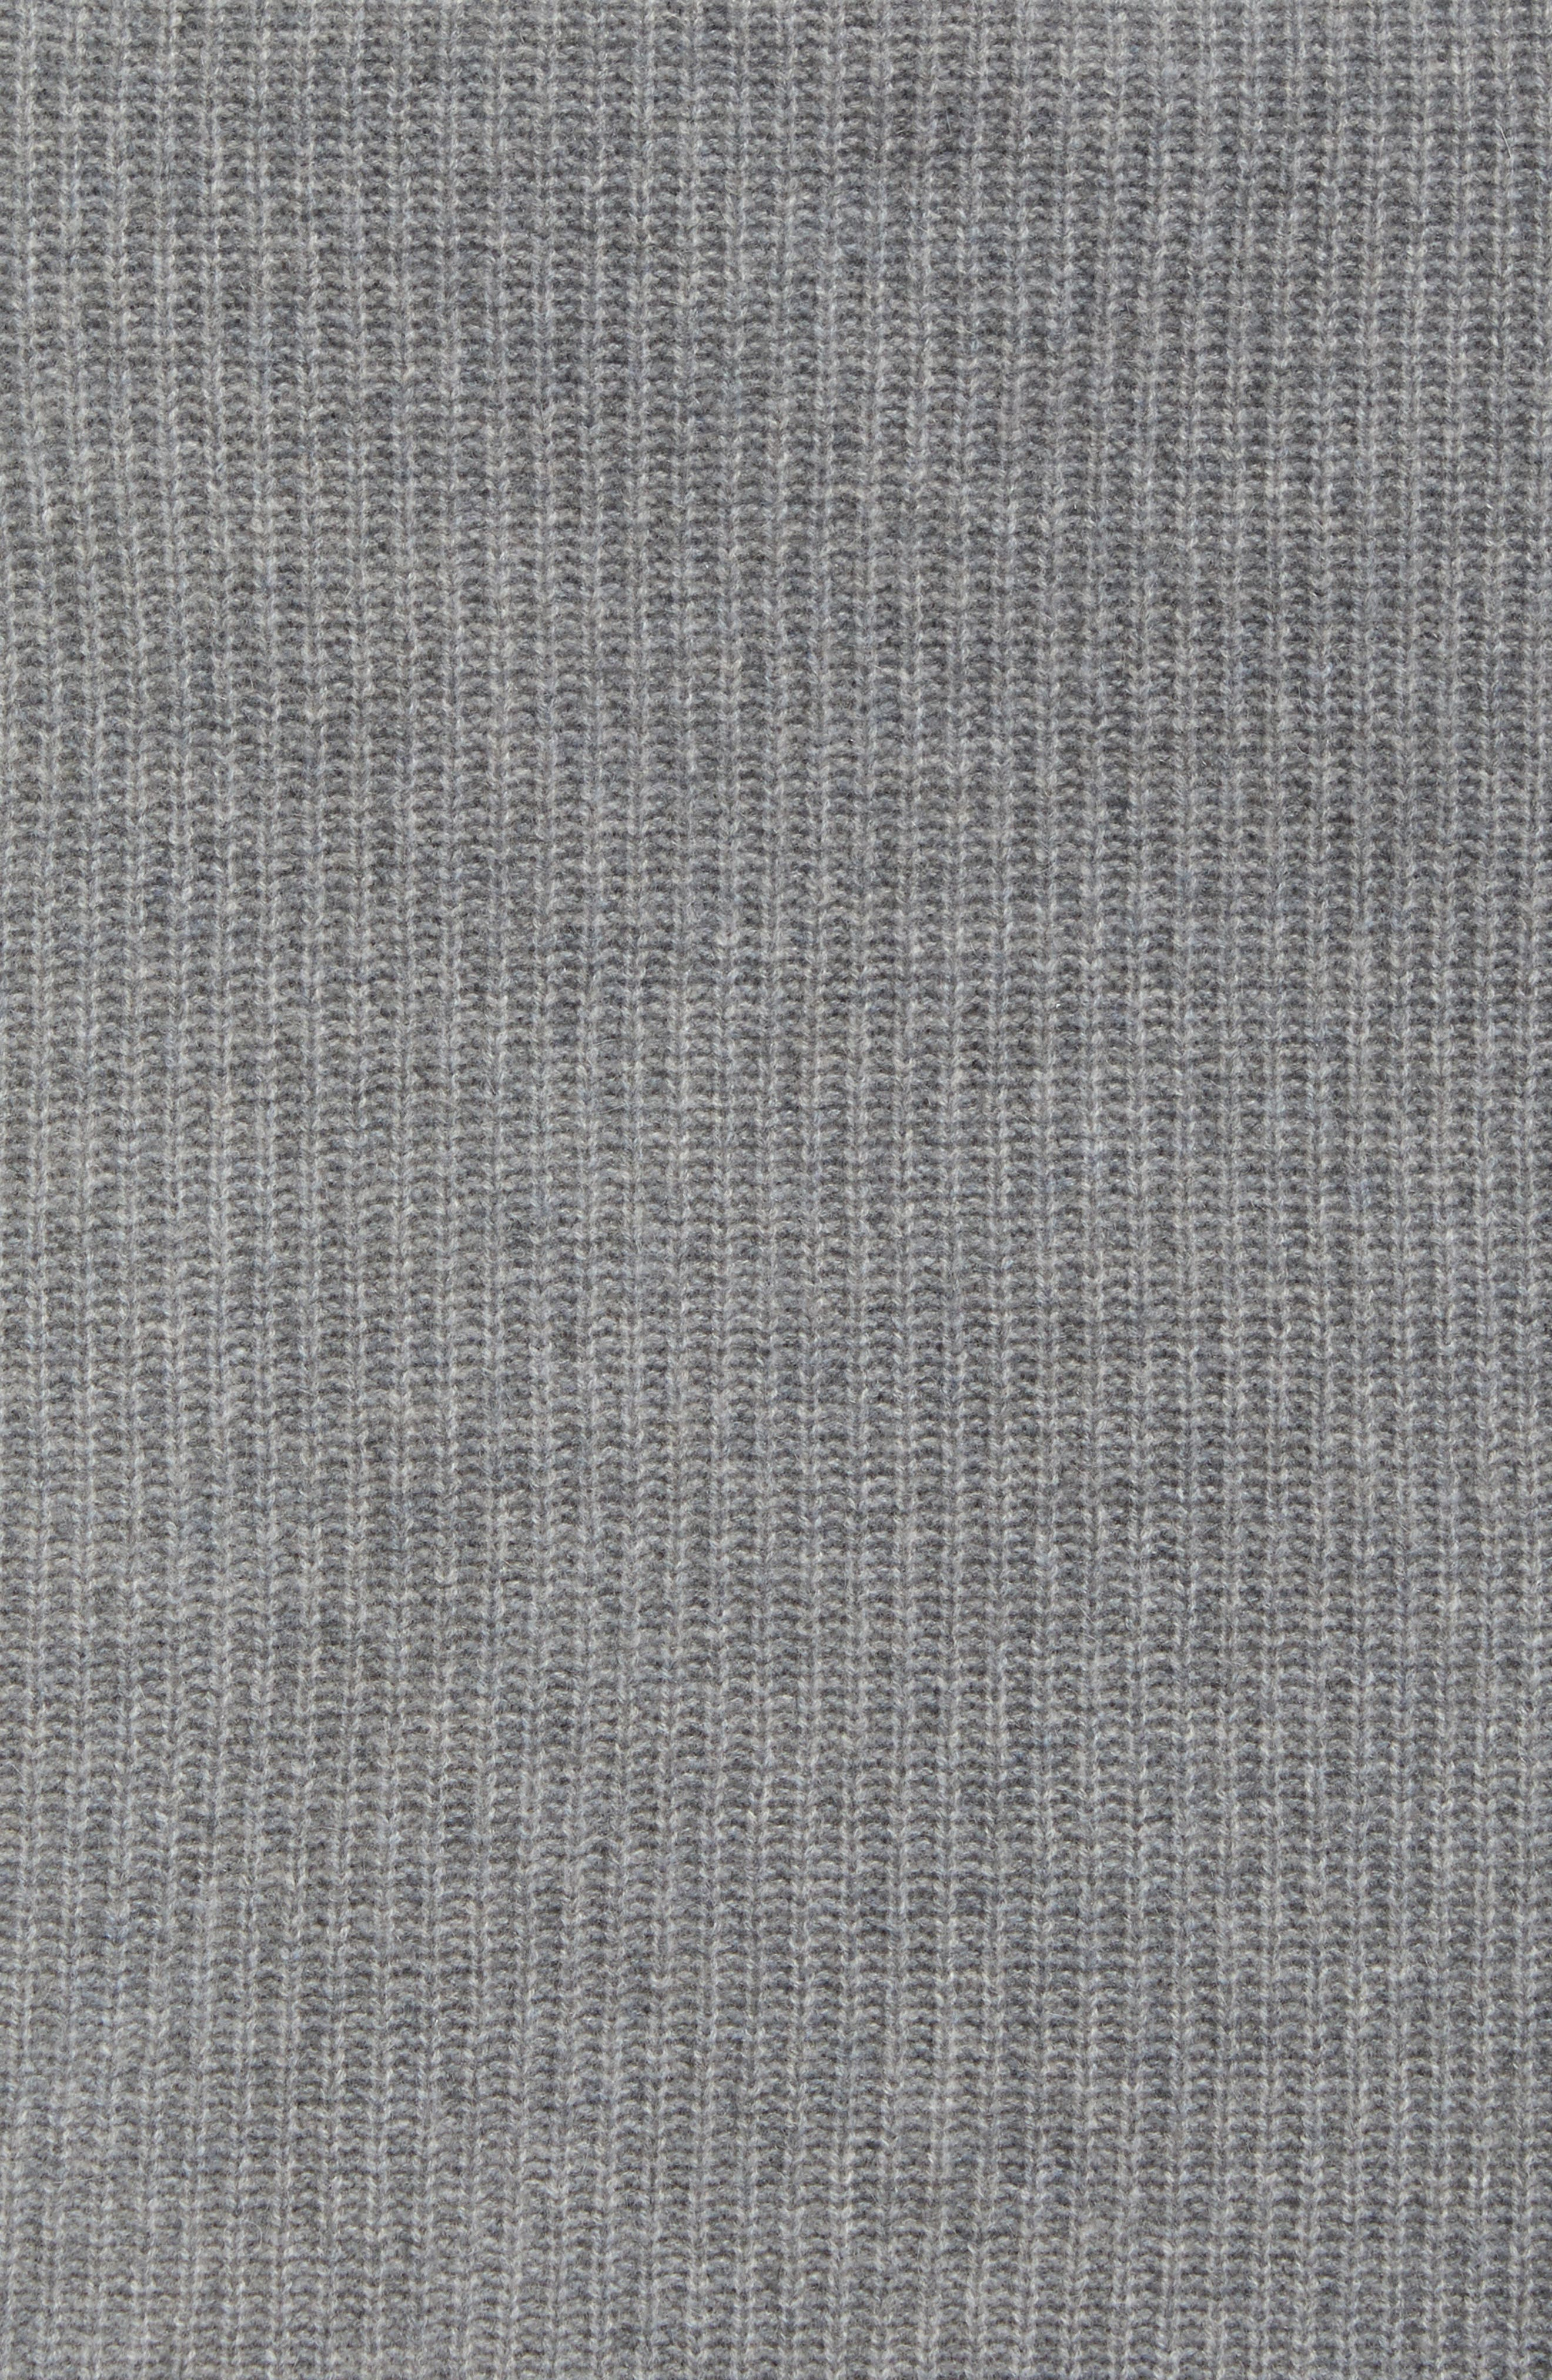 Alternate Image 3  - Nordstrom at Home Lattice Cashmere Throw Blanket